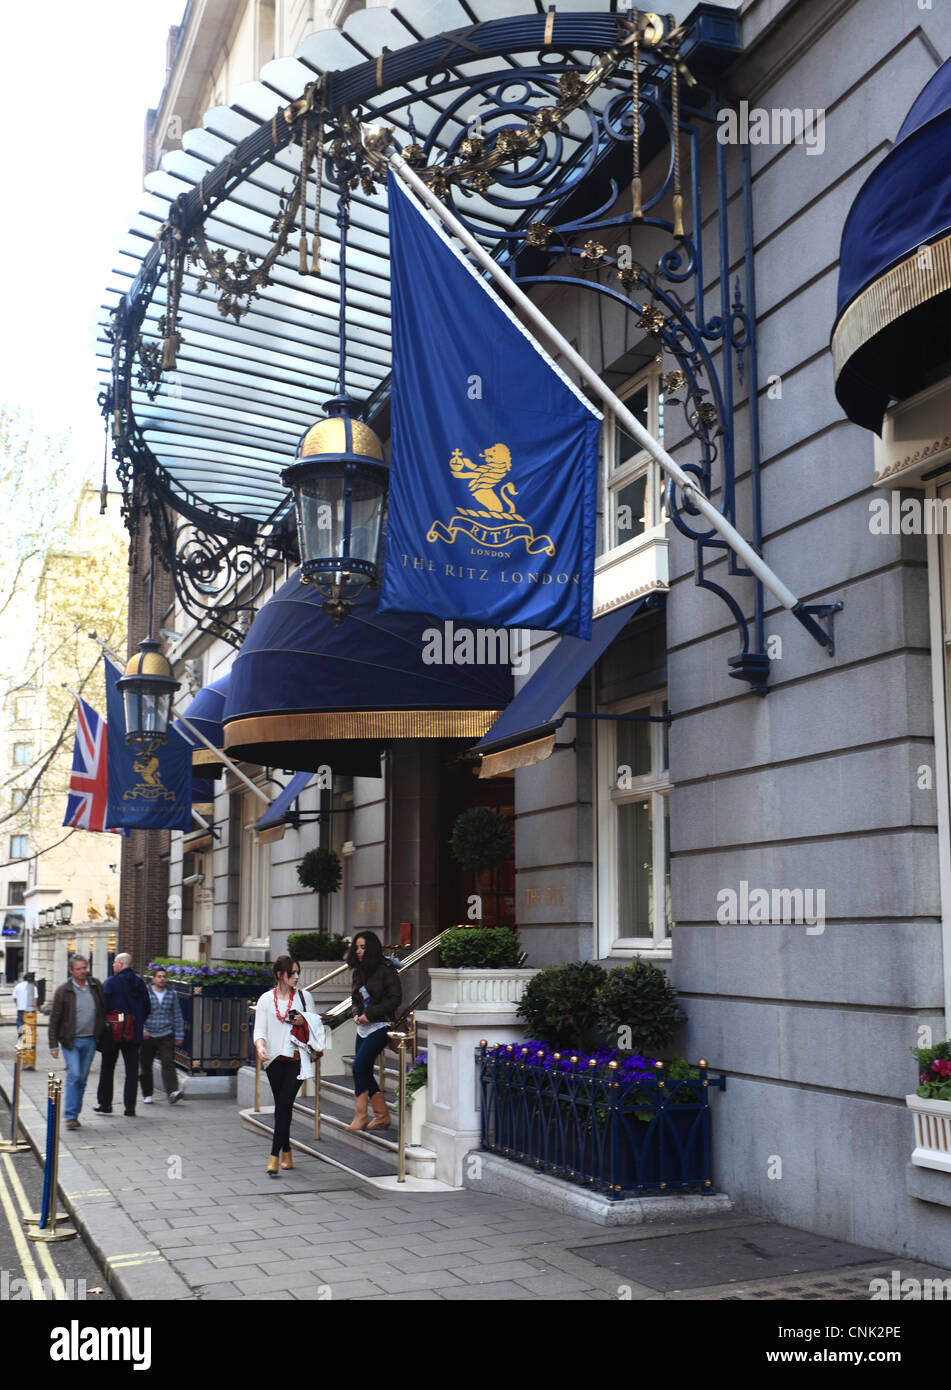 The Ritz Hotel London - Stock Image